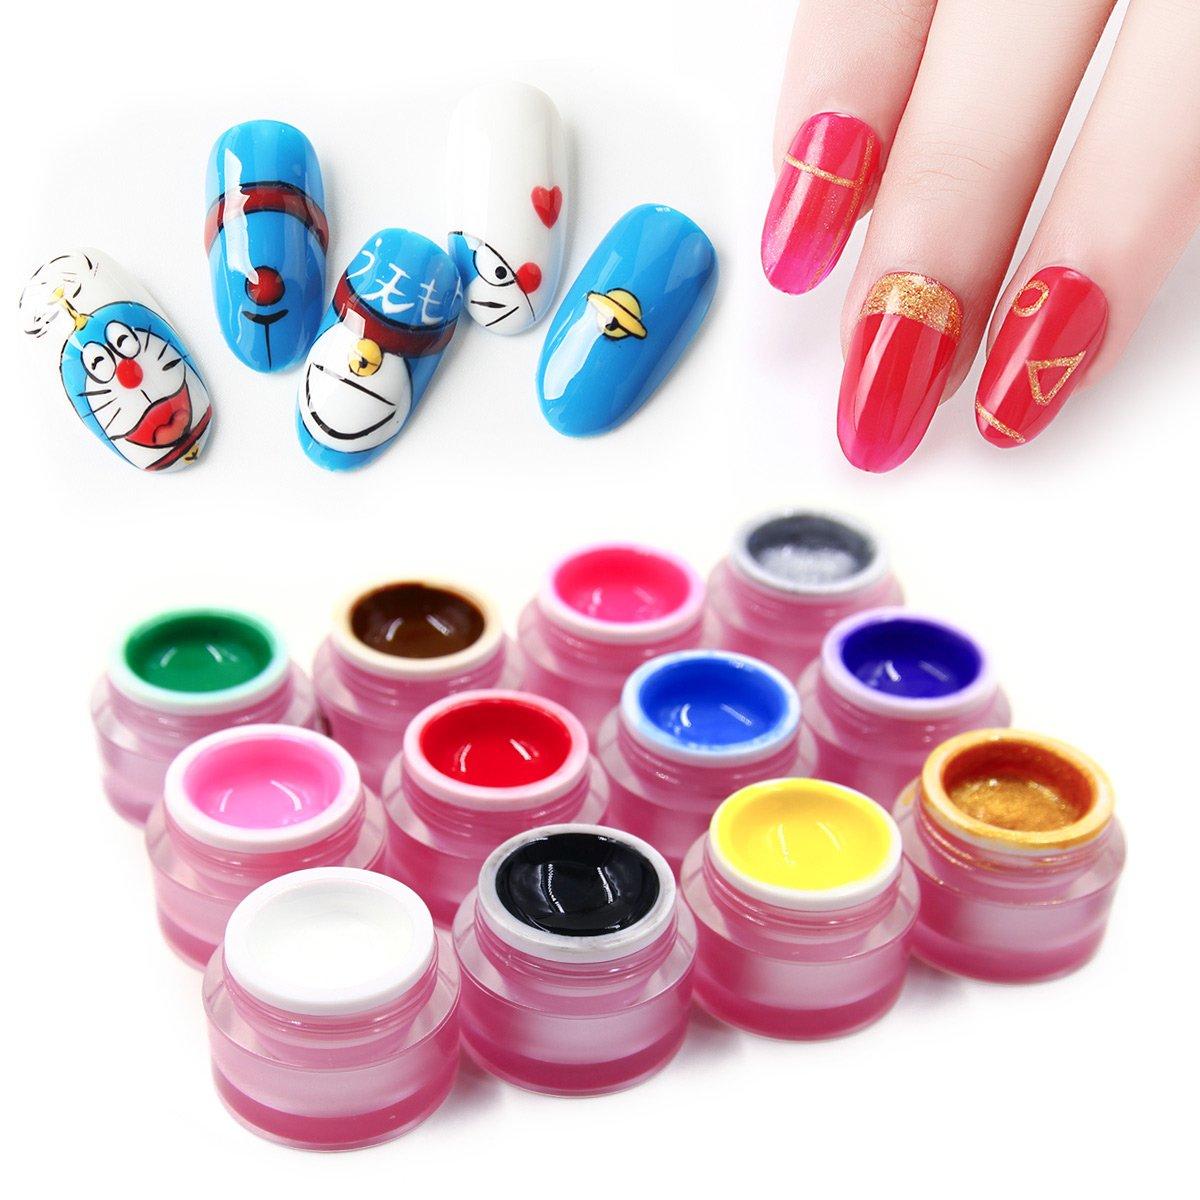 Amazon.com : 12 Colors Nail Painting Gel Polish, Saviland Soak Off ...